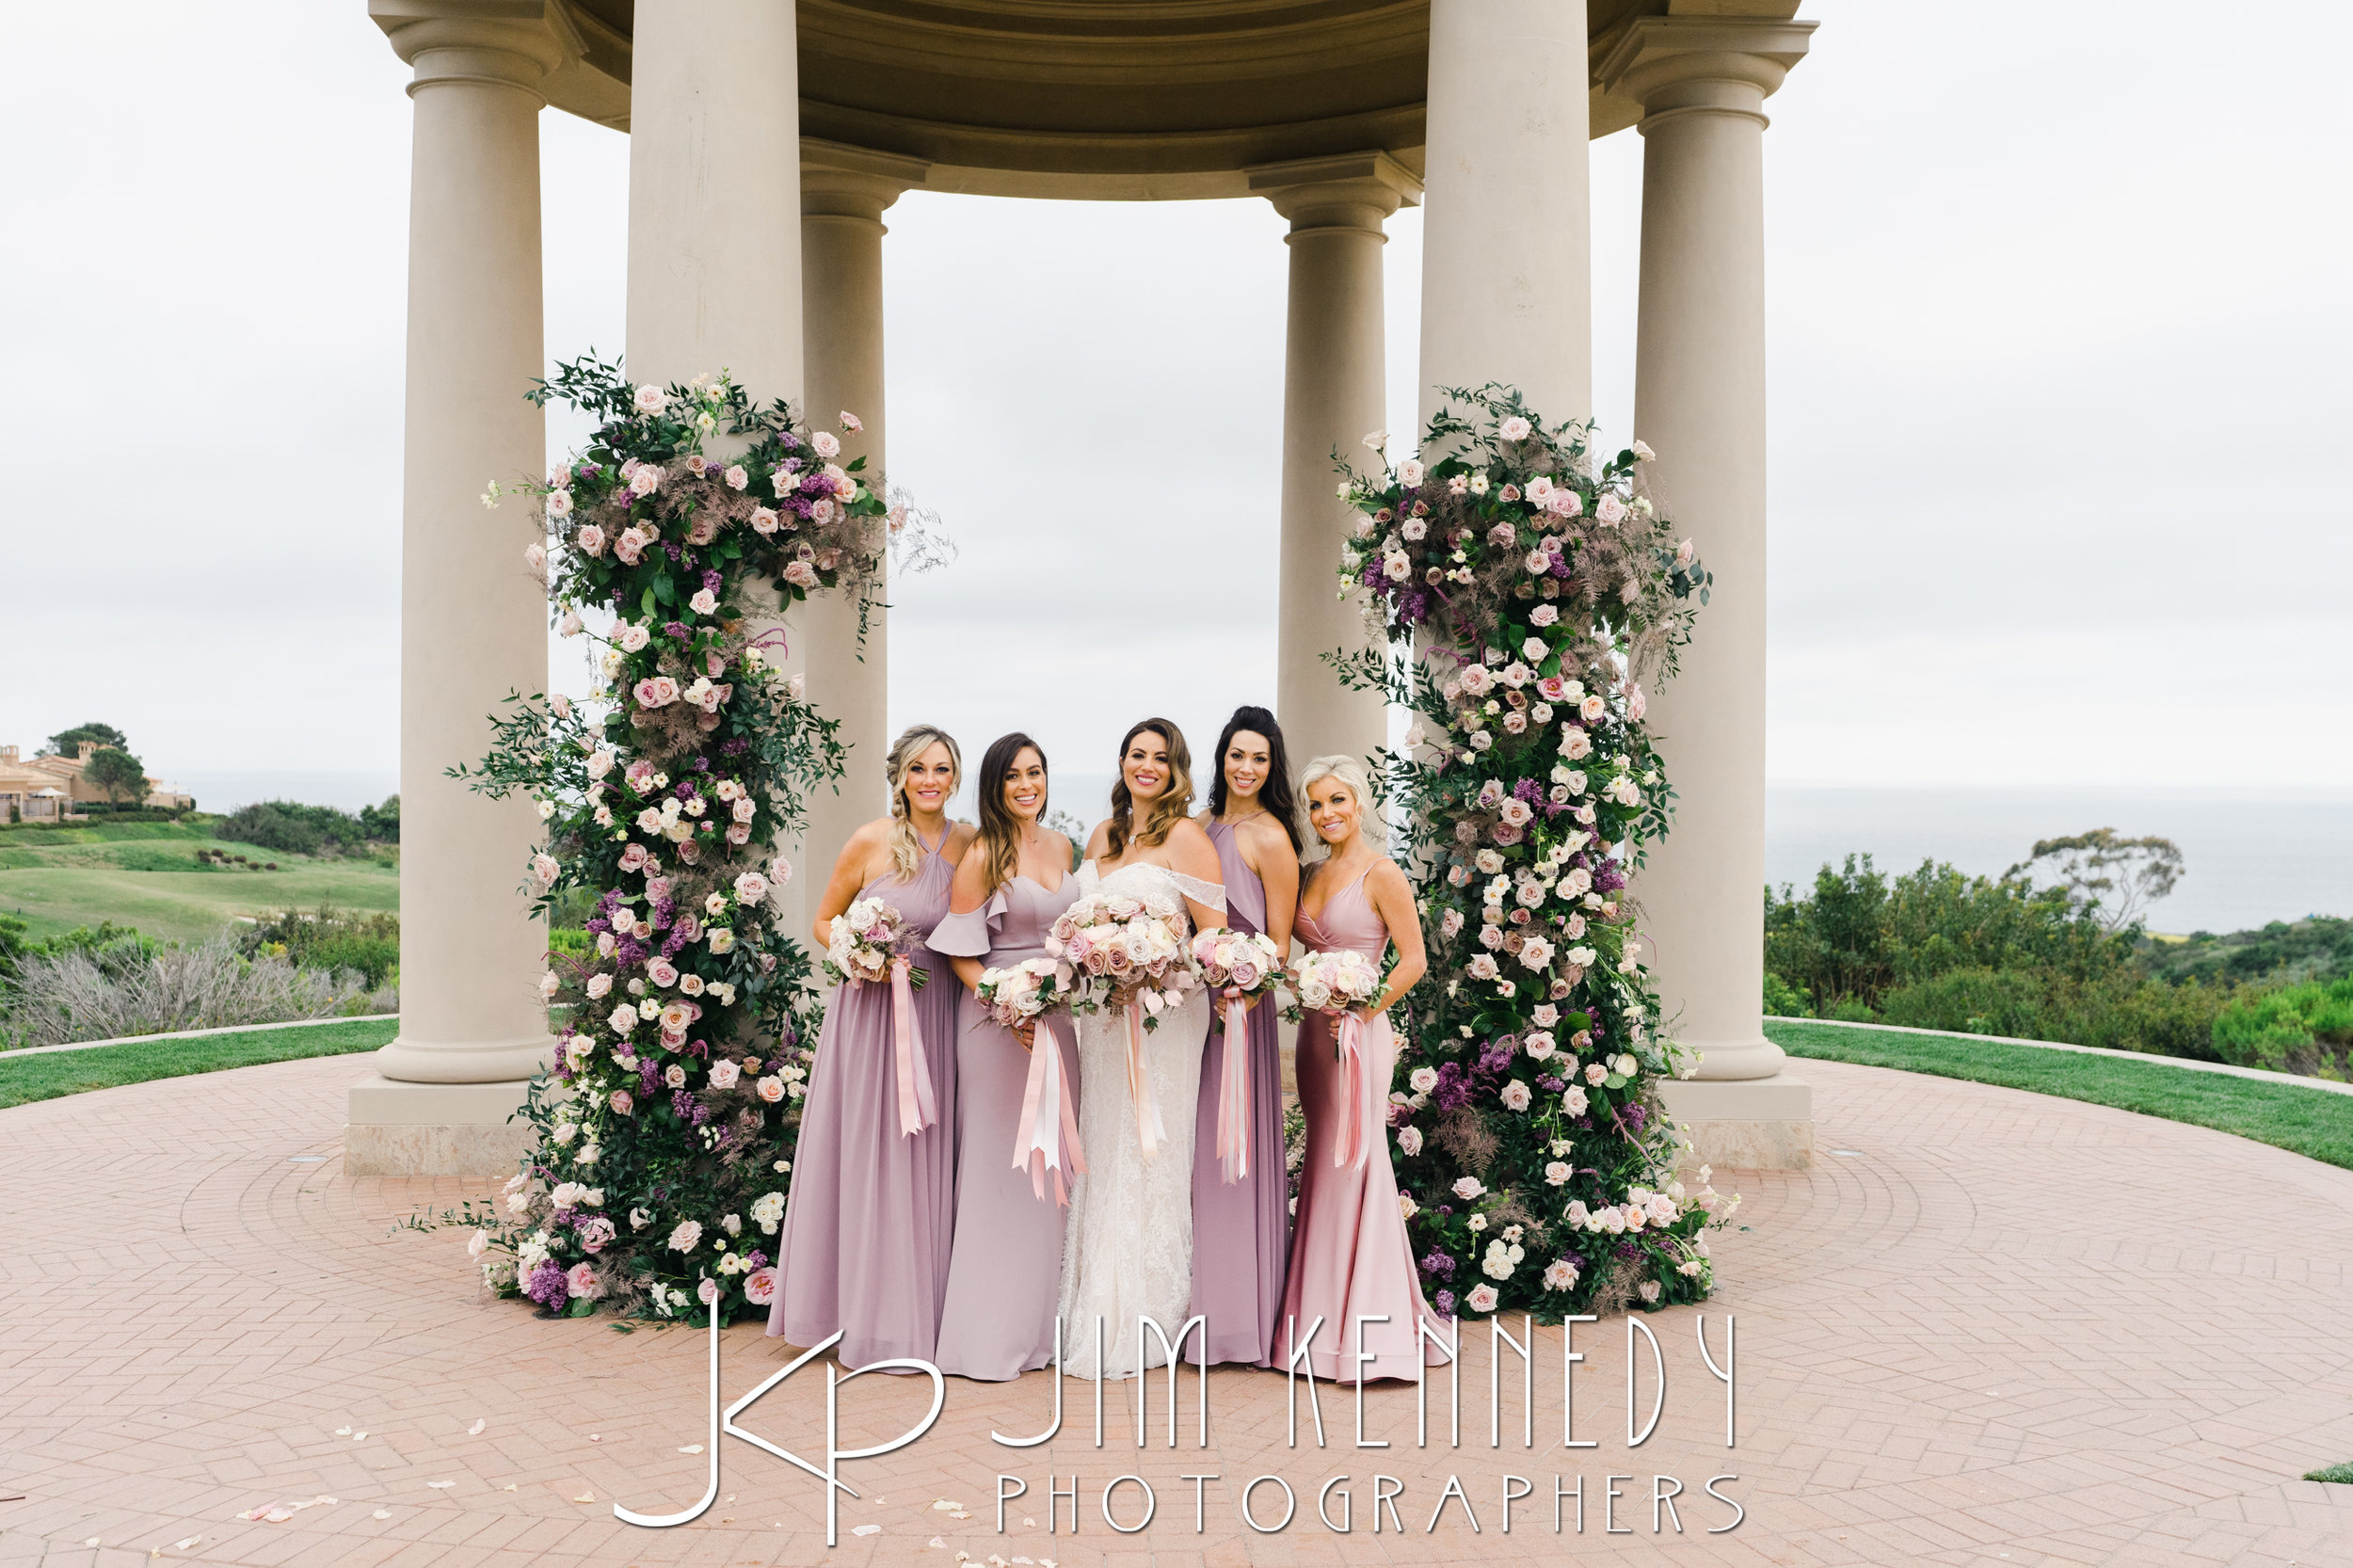 pelican-hill-wedding-jim-kenedy-photographers_0156.JPG